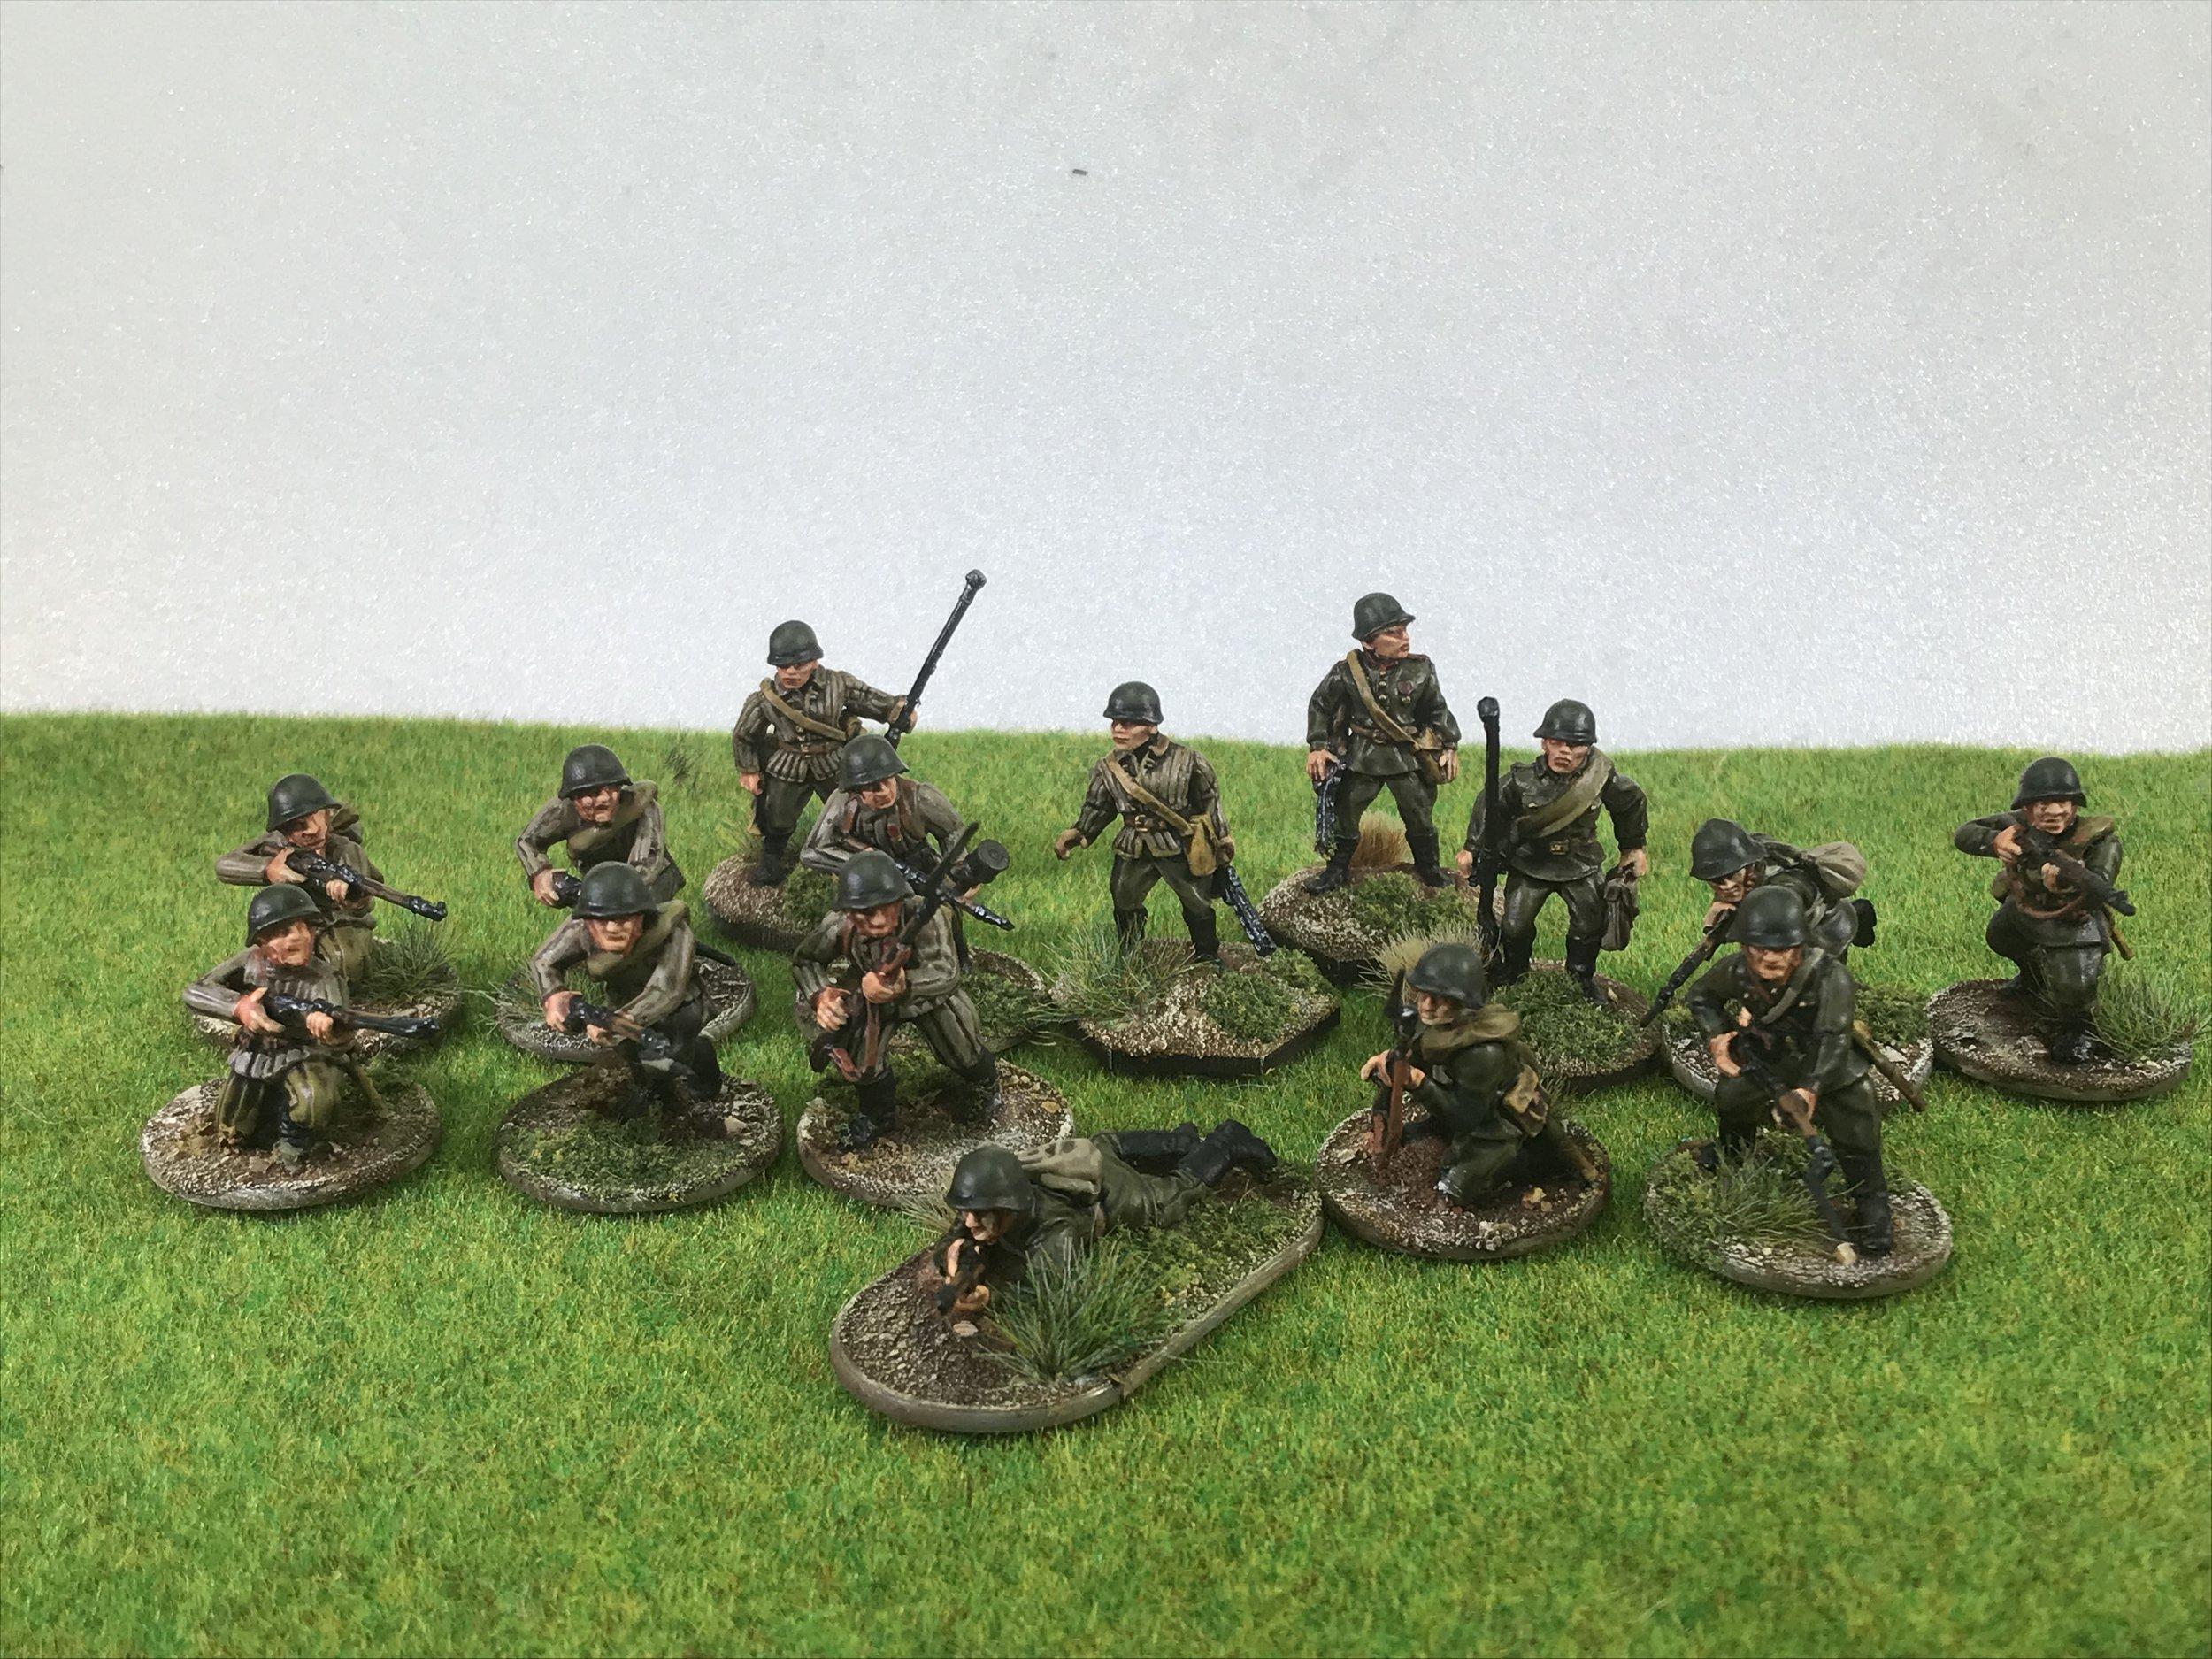 Some of Chris' WW2 Infantry